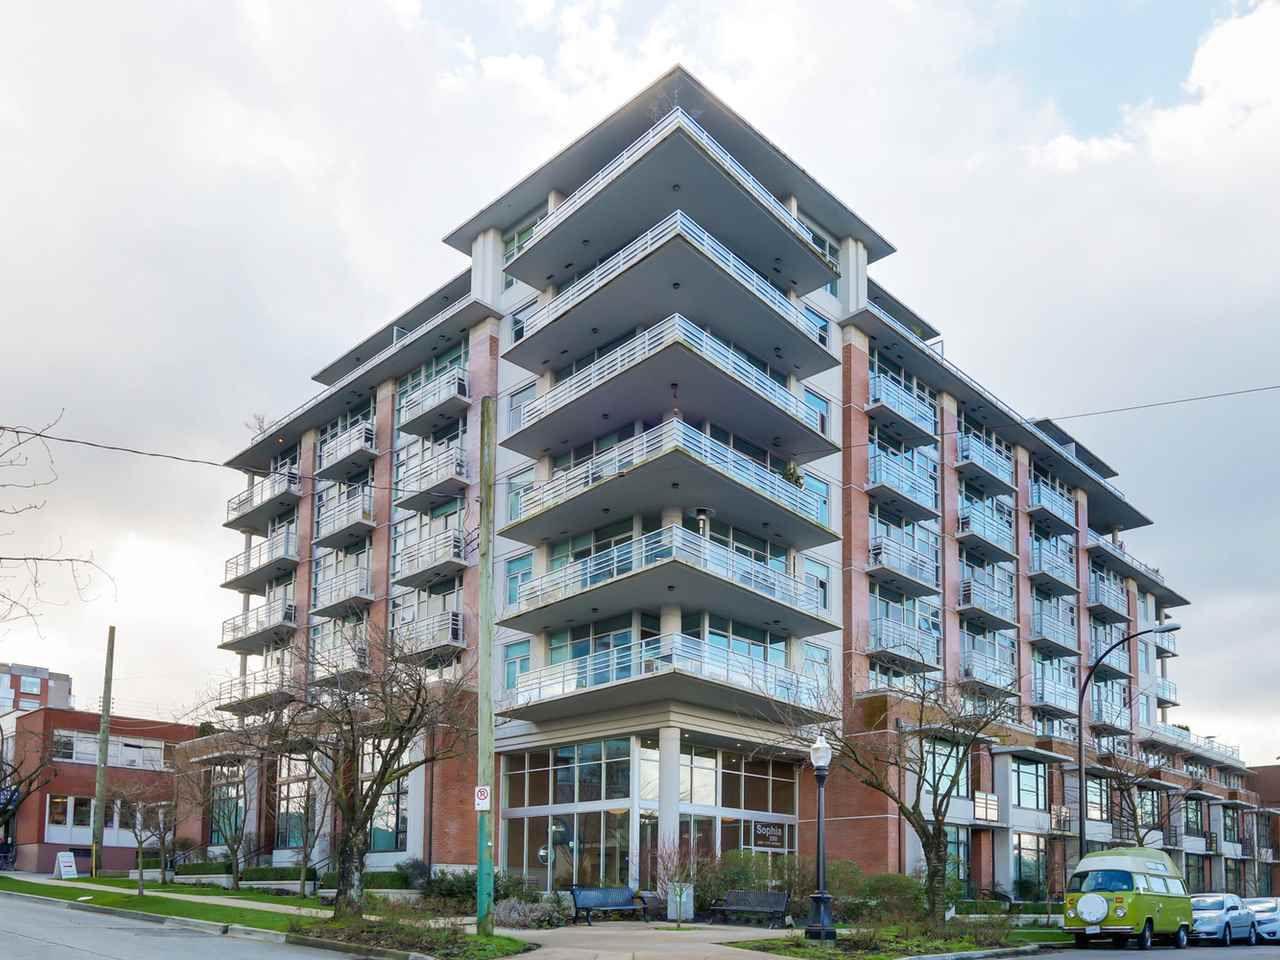 "Main Photo: 711 298 E 11TH AVENUE Avenue in Vancouver: Mount Pleasant VE Condo for sale in ""The SOPHIA"" (Vancouver East)  : MLS®# R2037901"